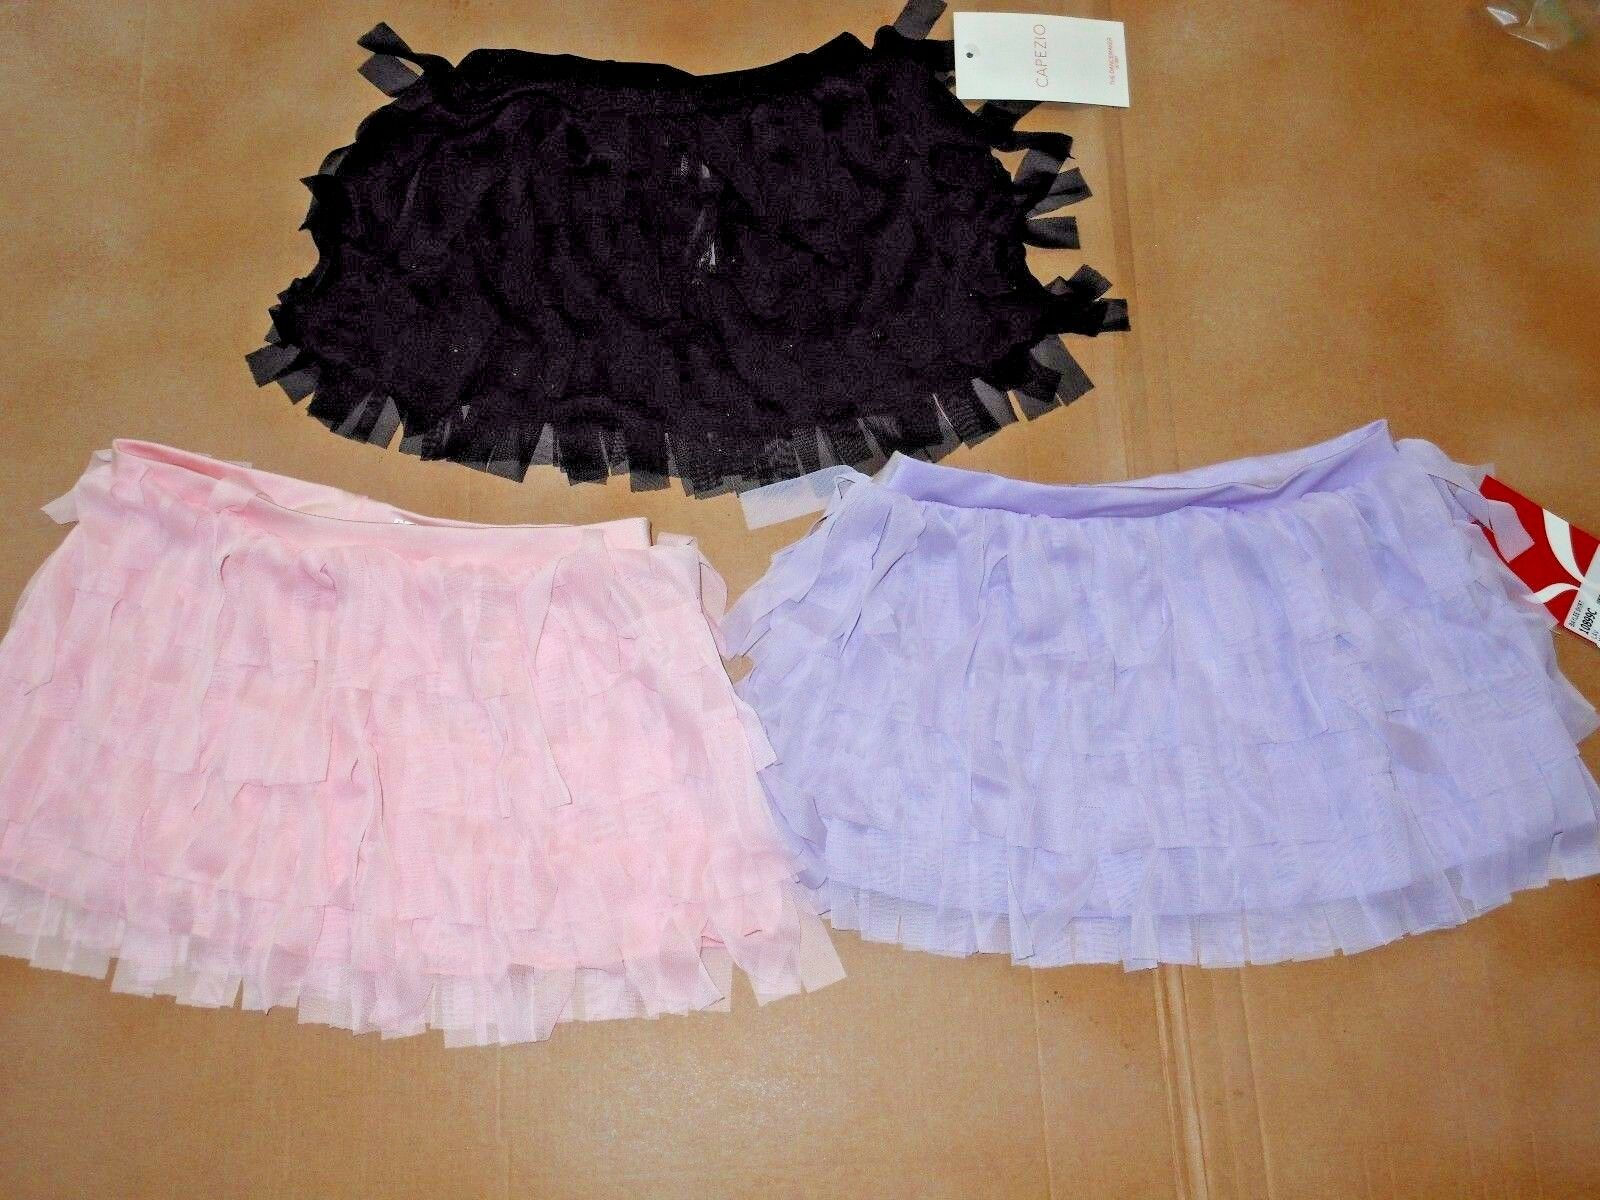 NWT Capezio 10899C Mesh Fringie dance skirt 3 colors girls s